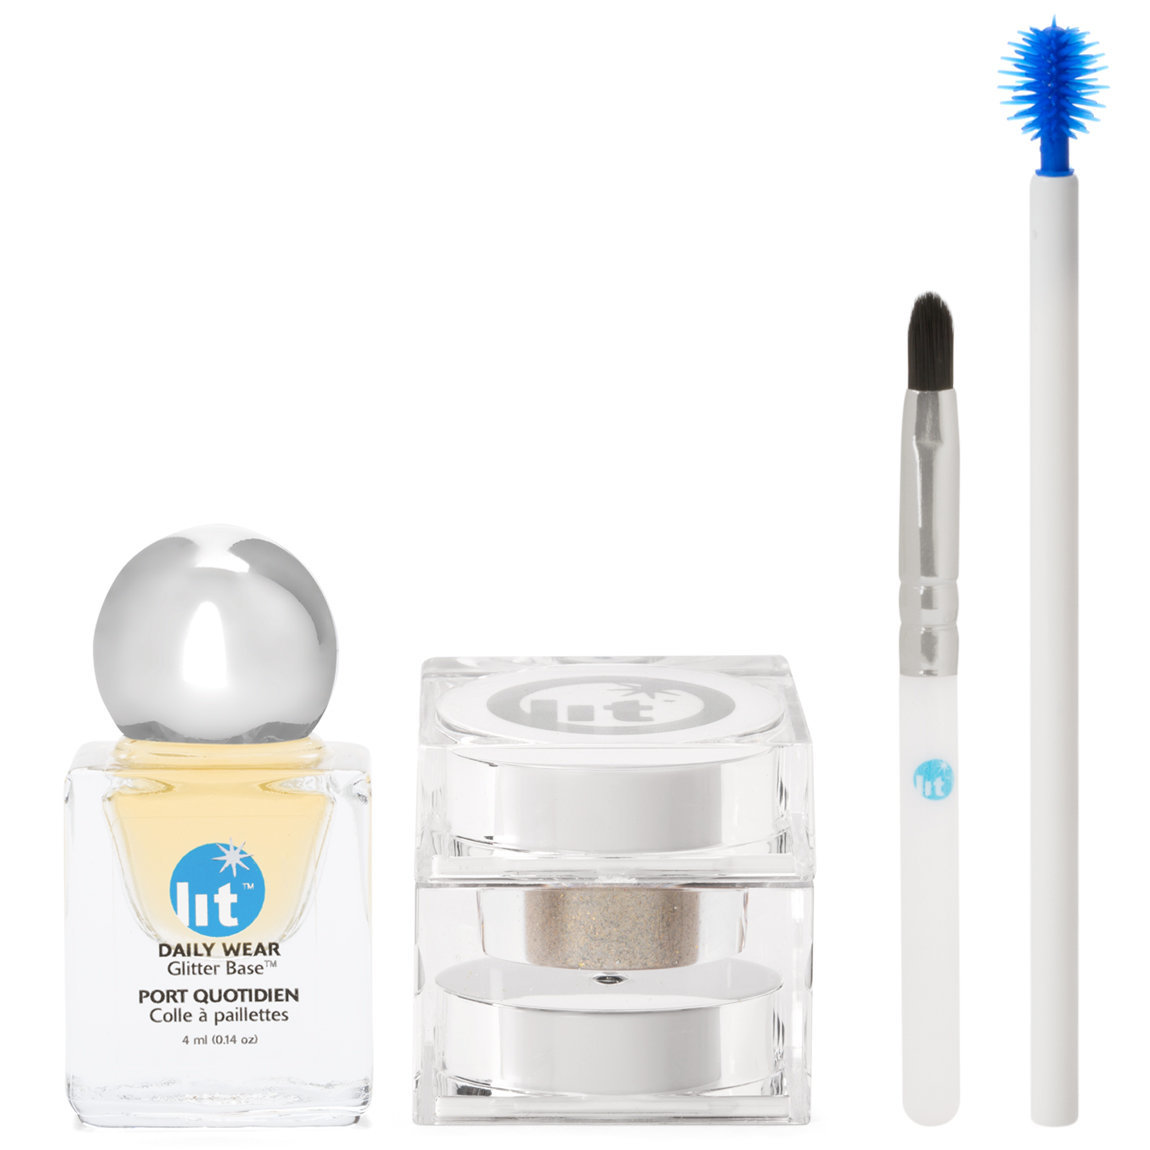 Lit Cosmetics Lit Kit: Lit Metal Kits Magnetic (Gold) alternative view 1.